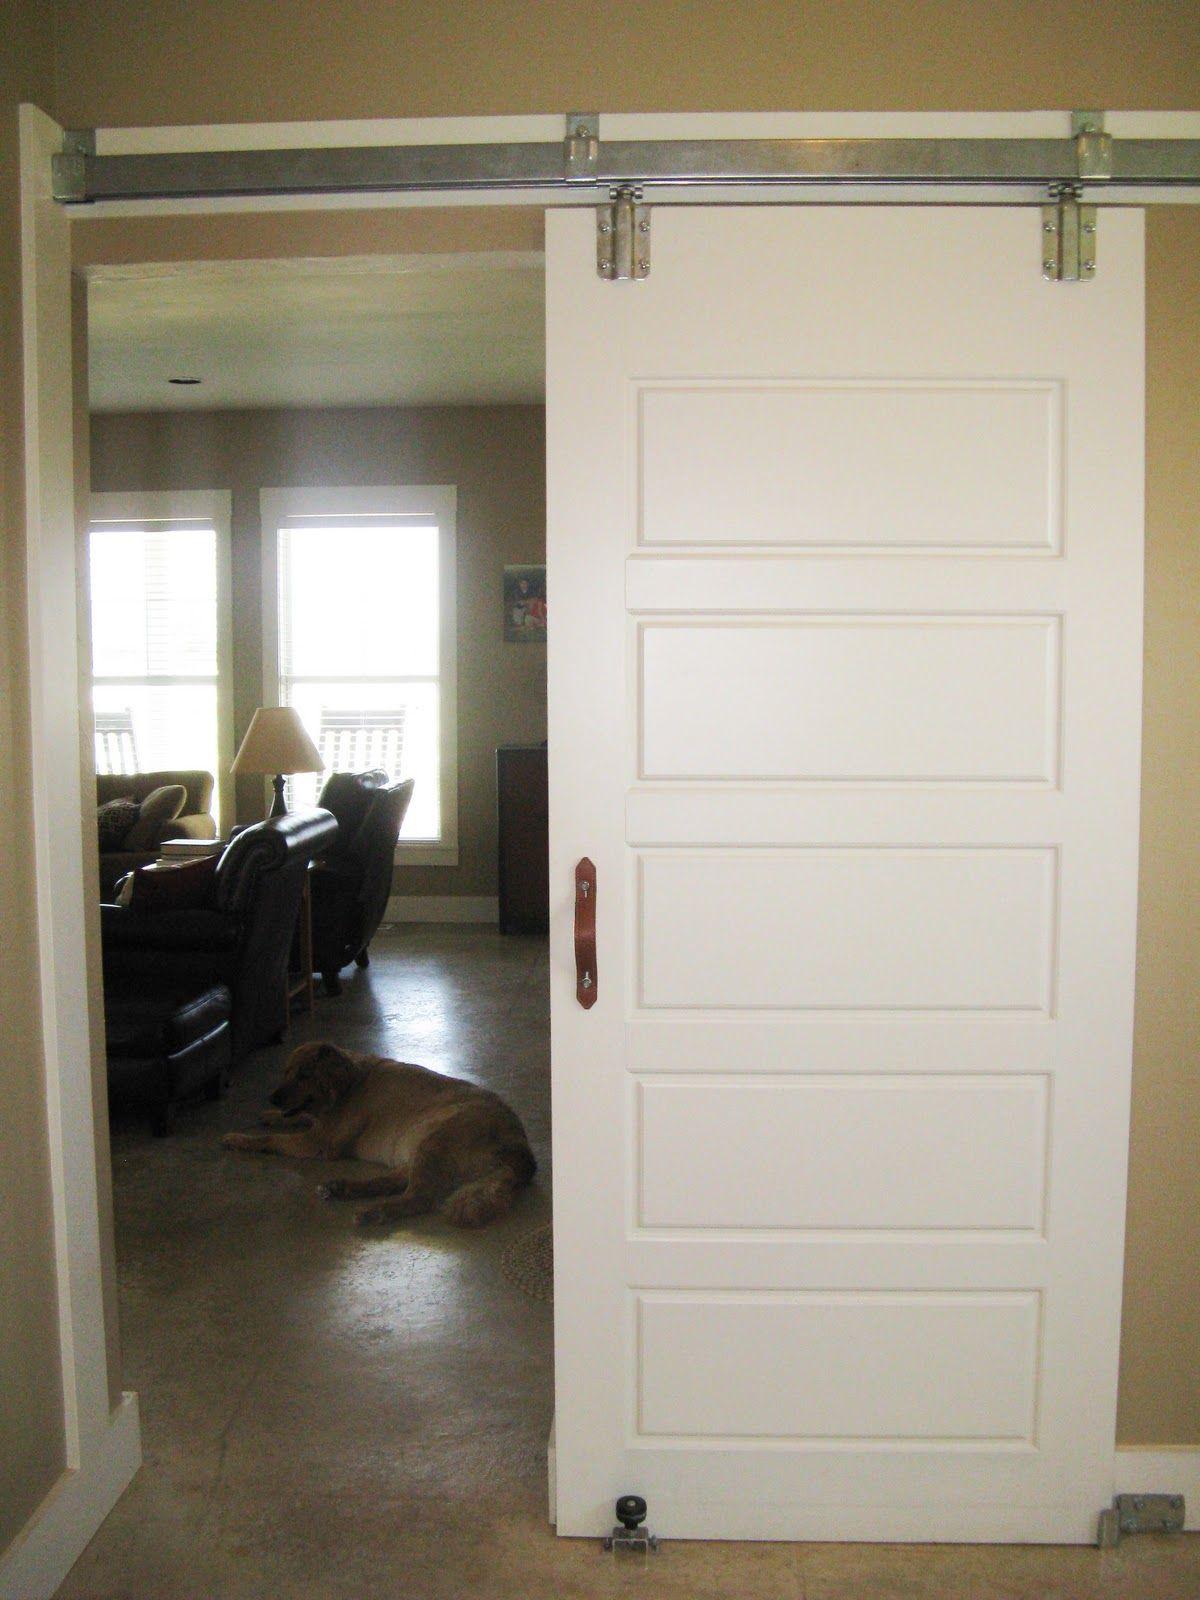 Open red barn doors - Barn Board Walls White Trim Little Red Farmhouse Favorite Farmhouse Feature